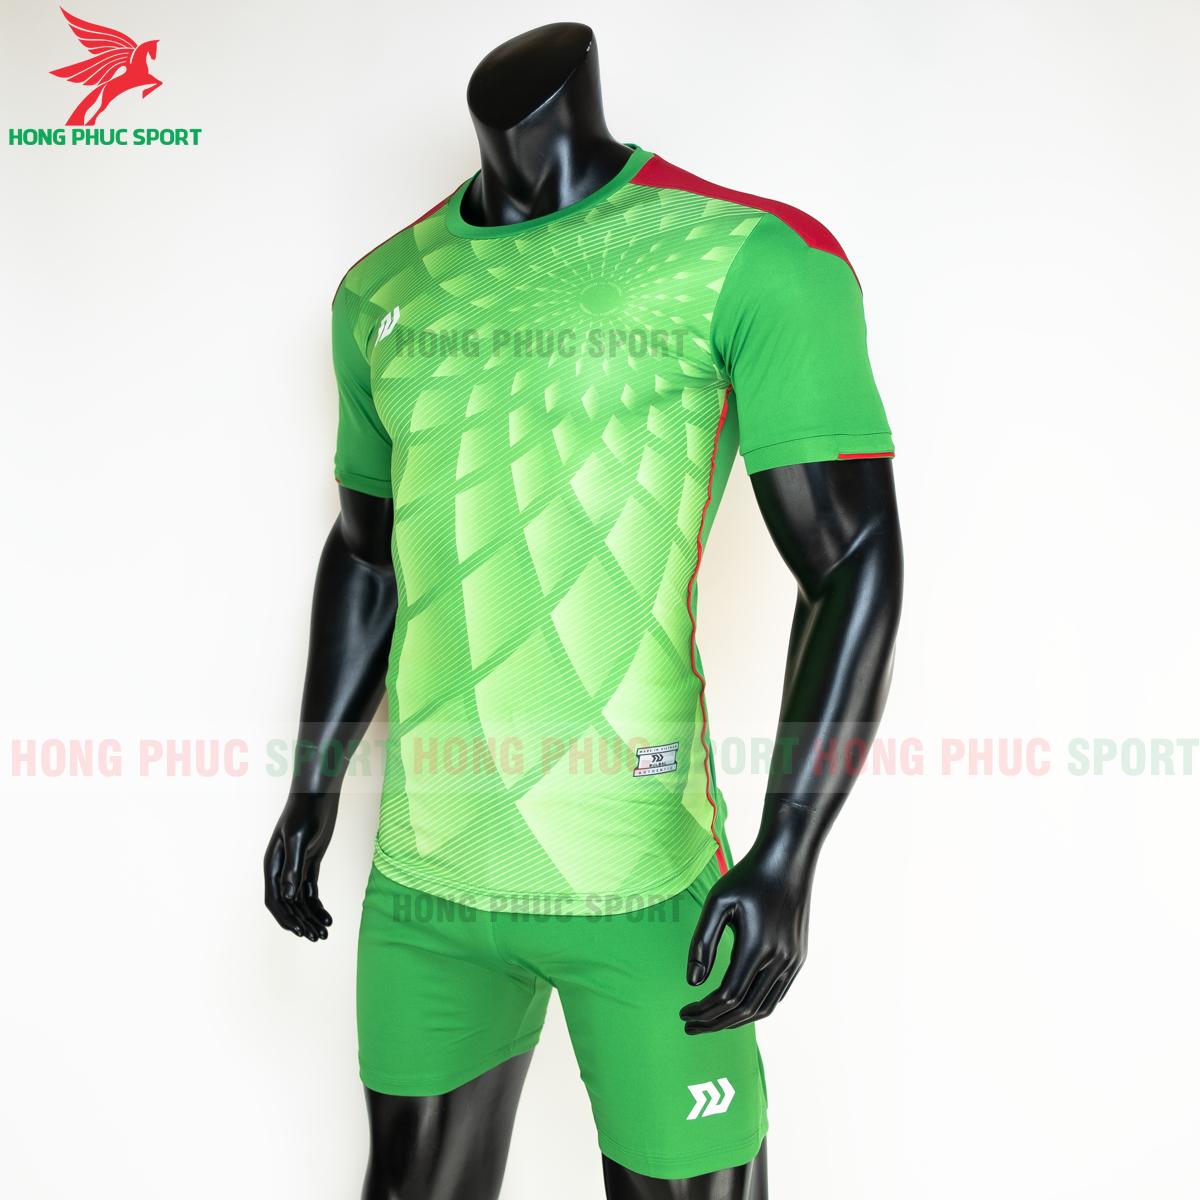 https://cdn.hongphucsport.com/unsafe/s4.shopbay.vn/files/285/ao-bong-da-khong-logo-bulbal-lotus-mau-xanh-la-4-6050114b0d621.png